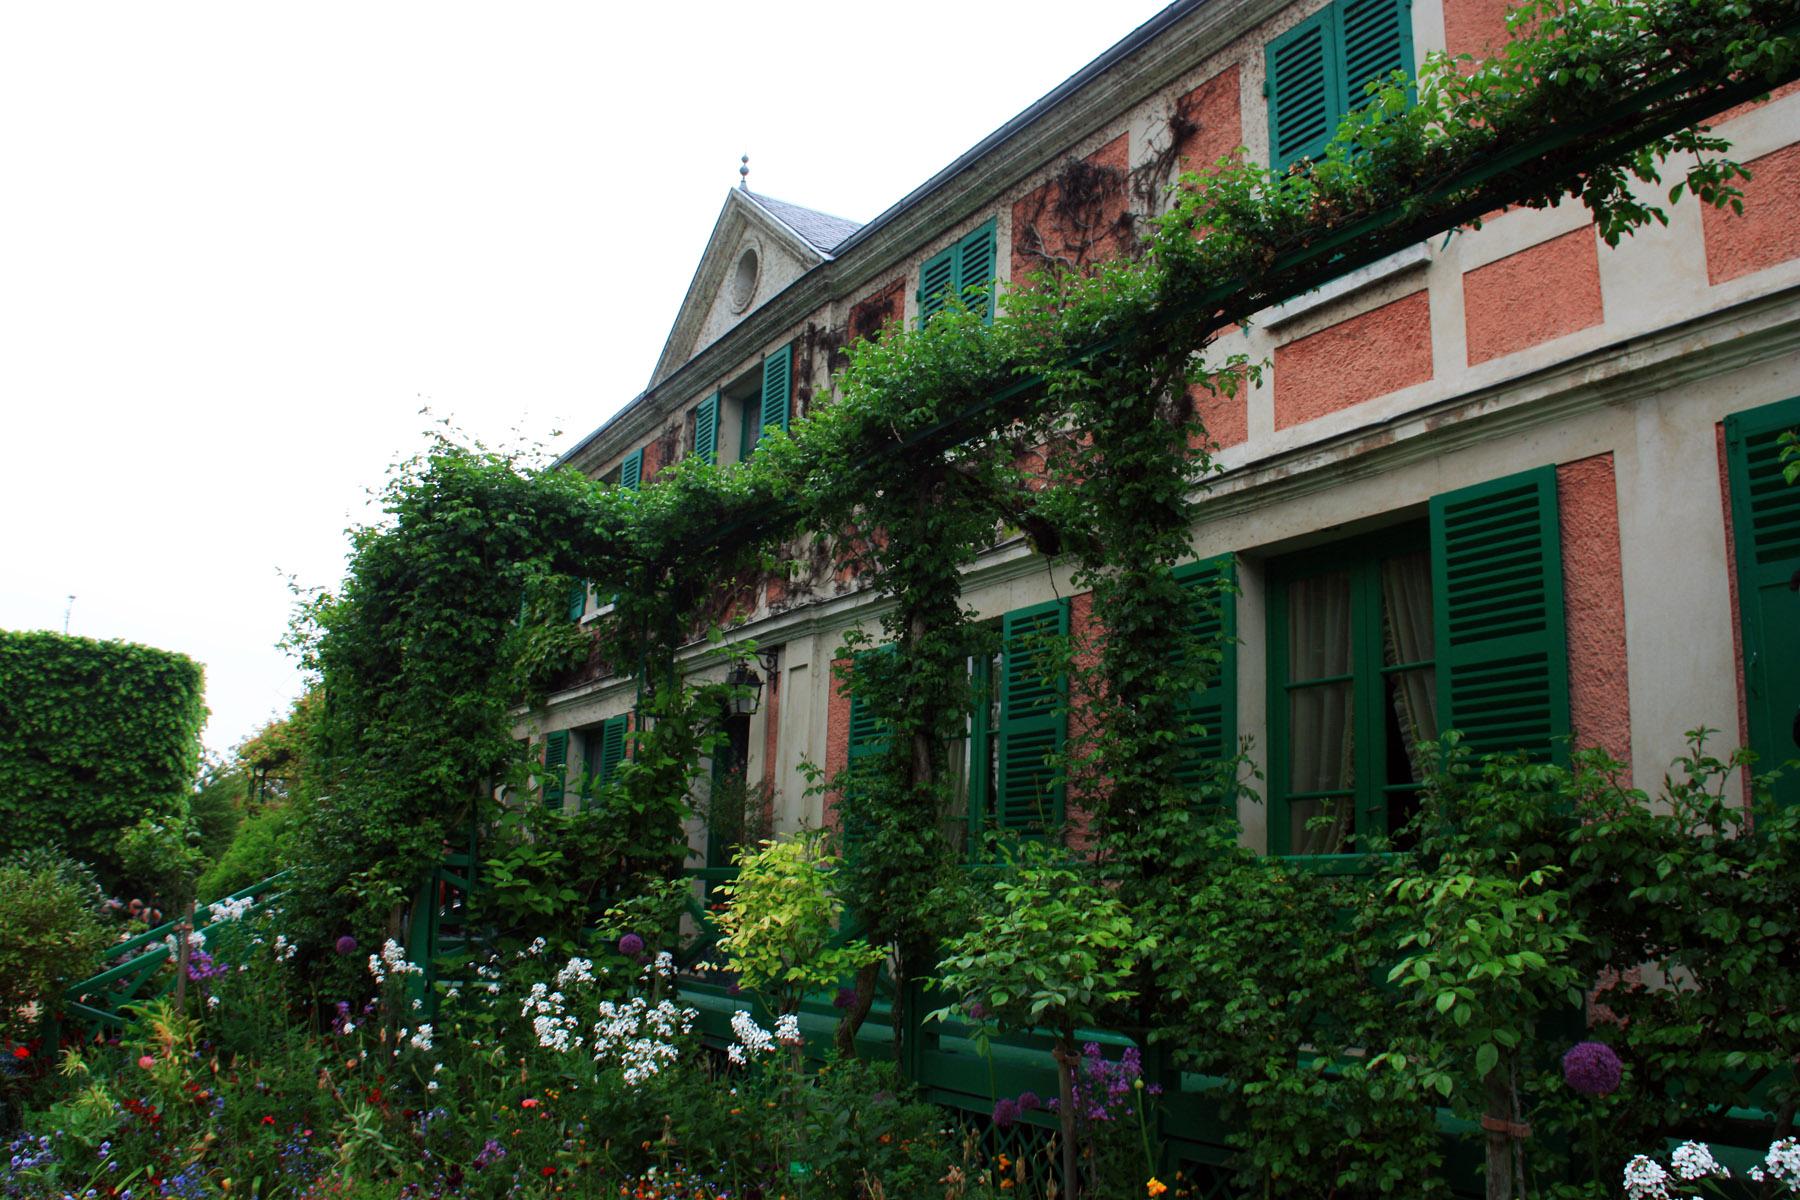 Une promenade dans les jardins de Giverny